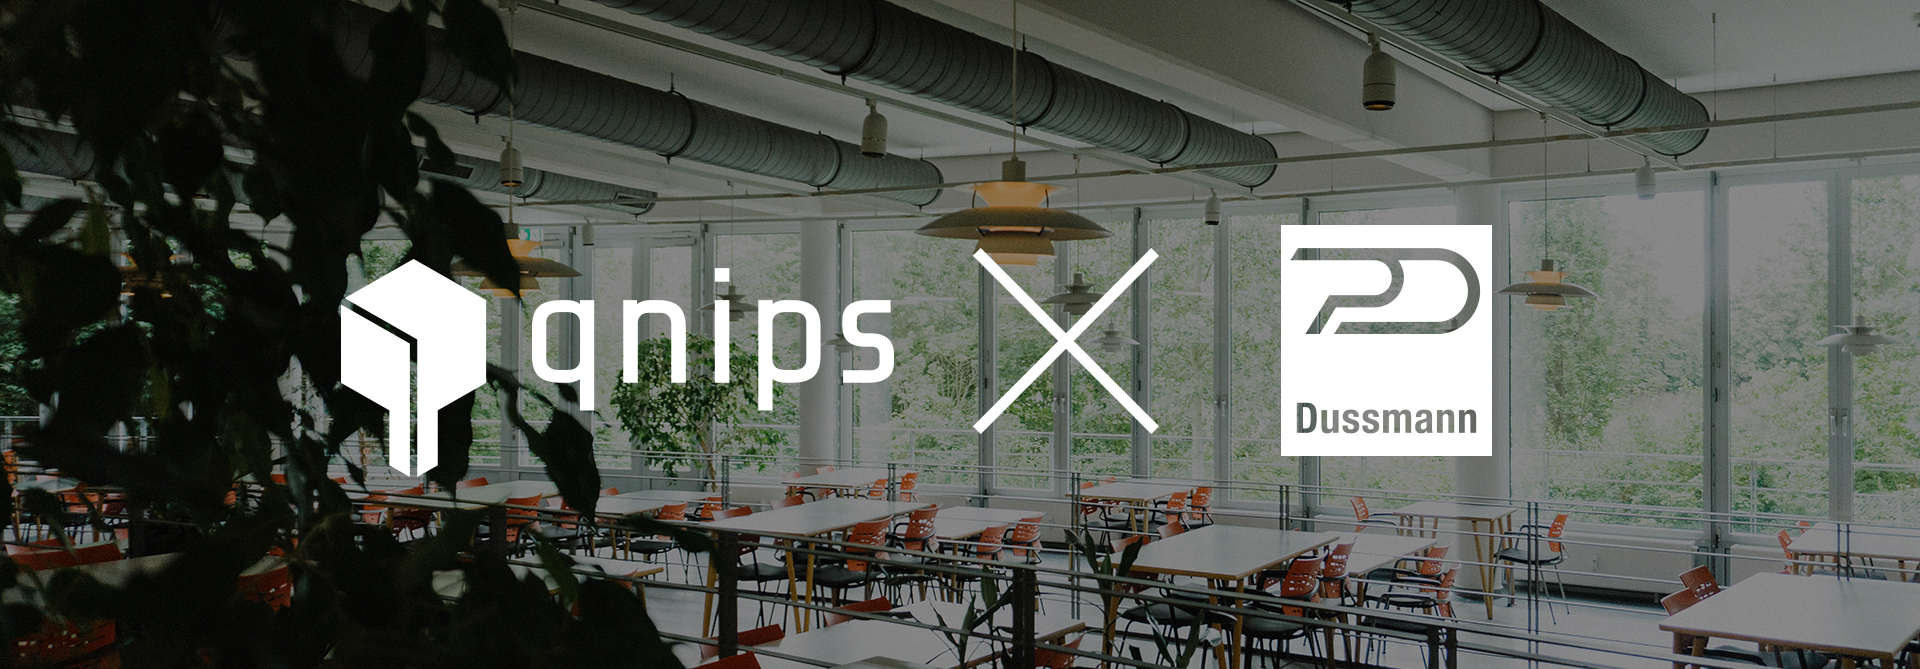 qnips meets Dussmann Catering